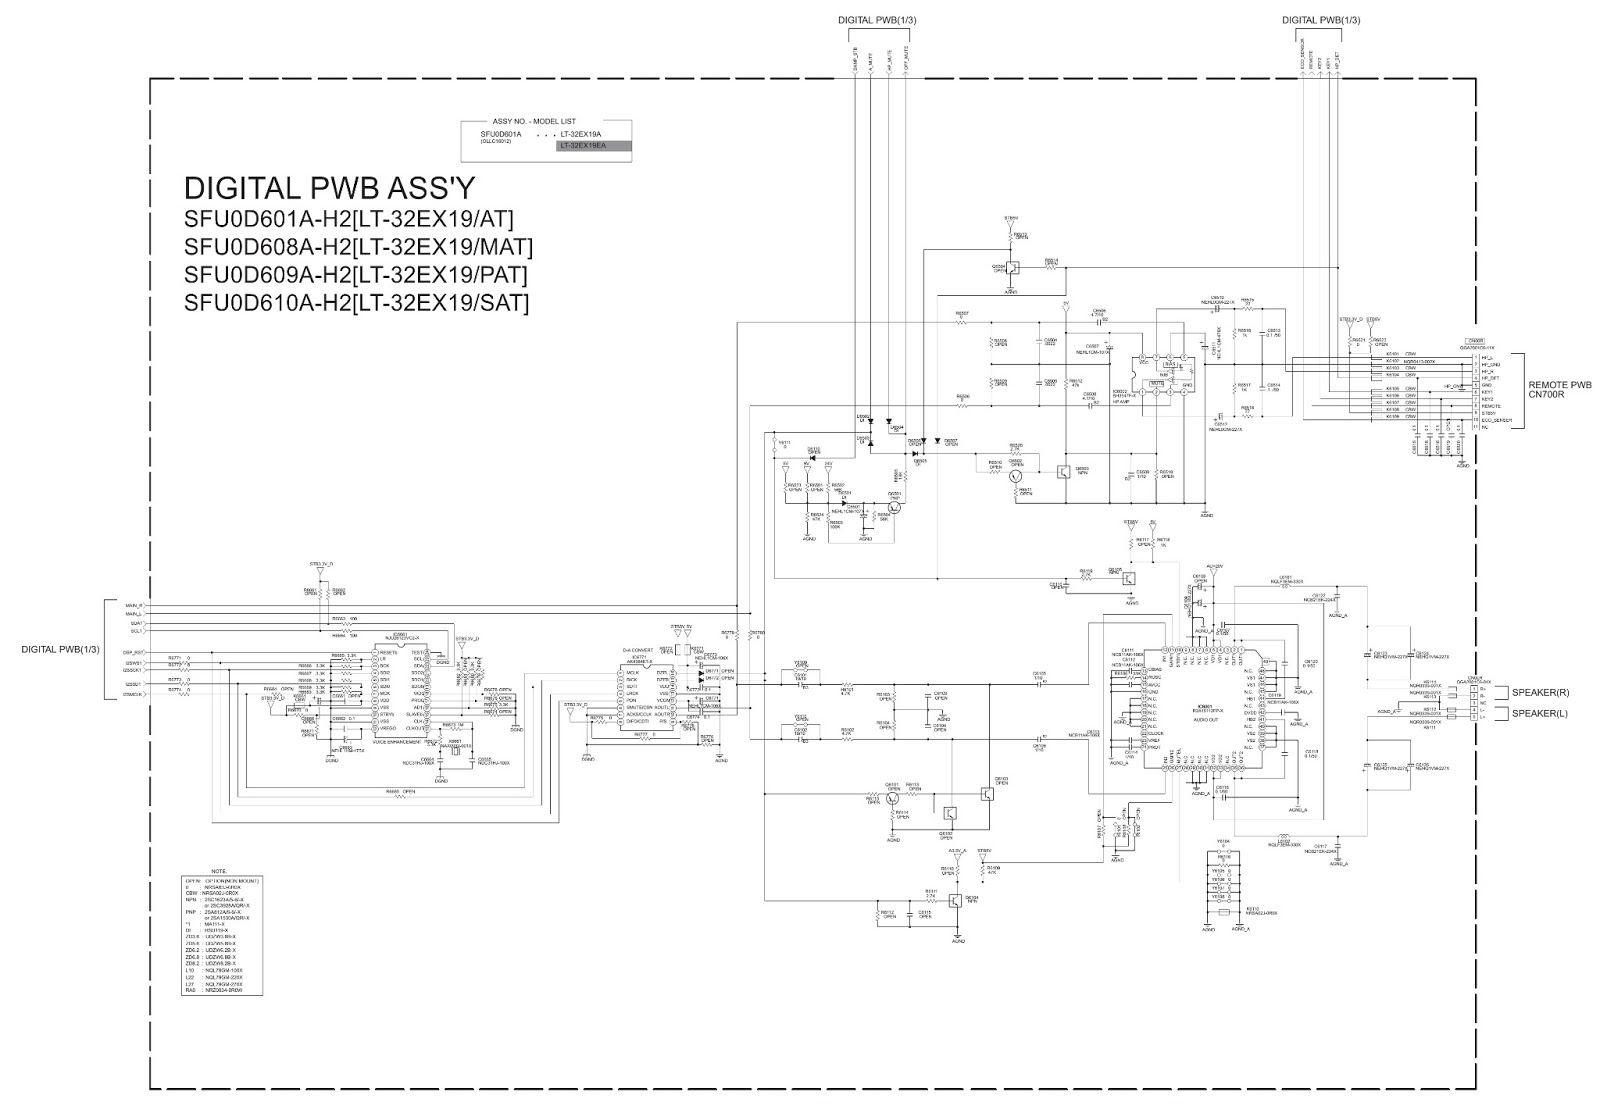 samsung led tv circuit diagram pdf lt-32ex29 - lt-32ex19 - jvc lcd tv - main power supply ...